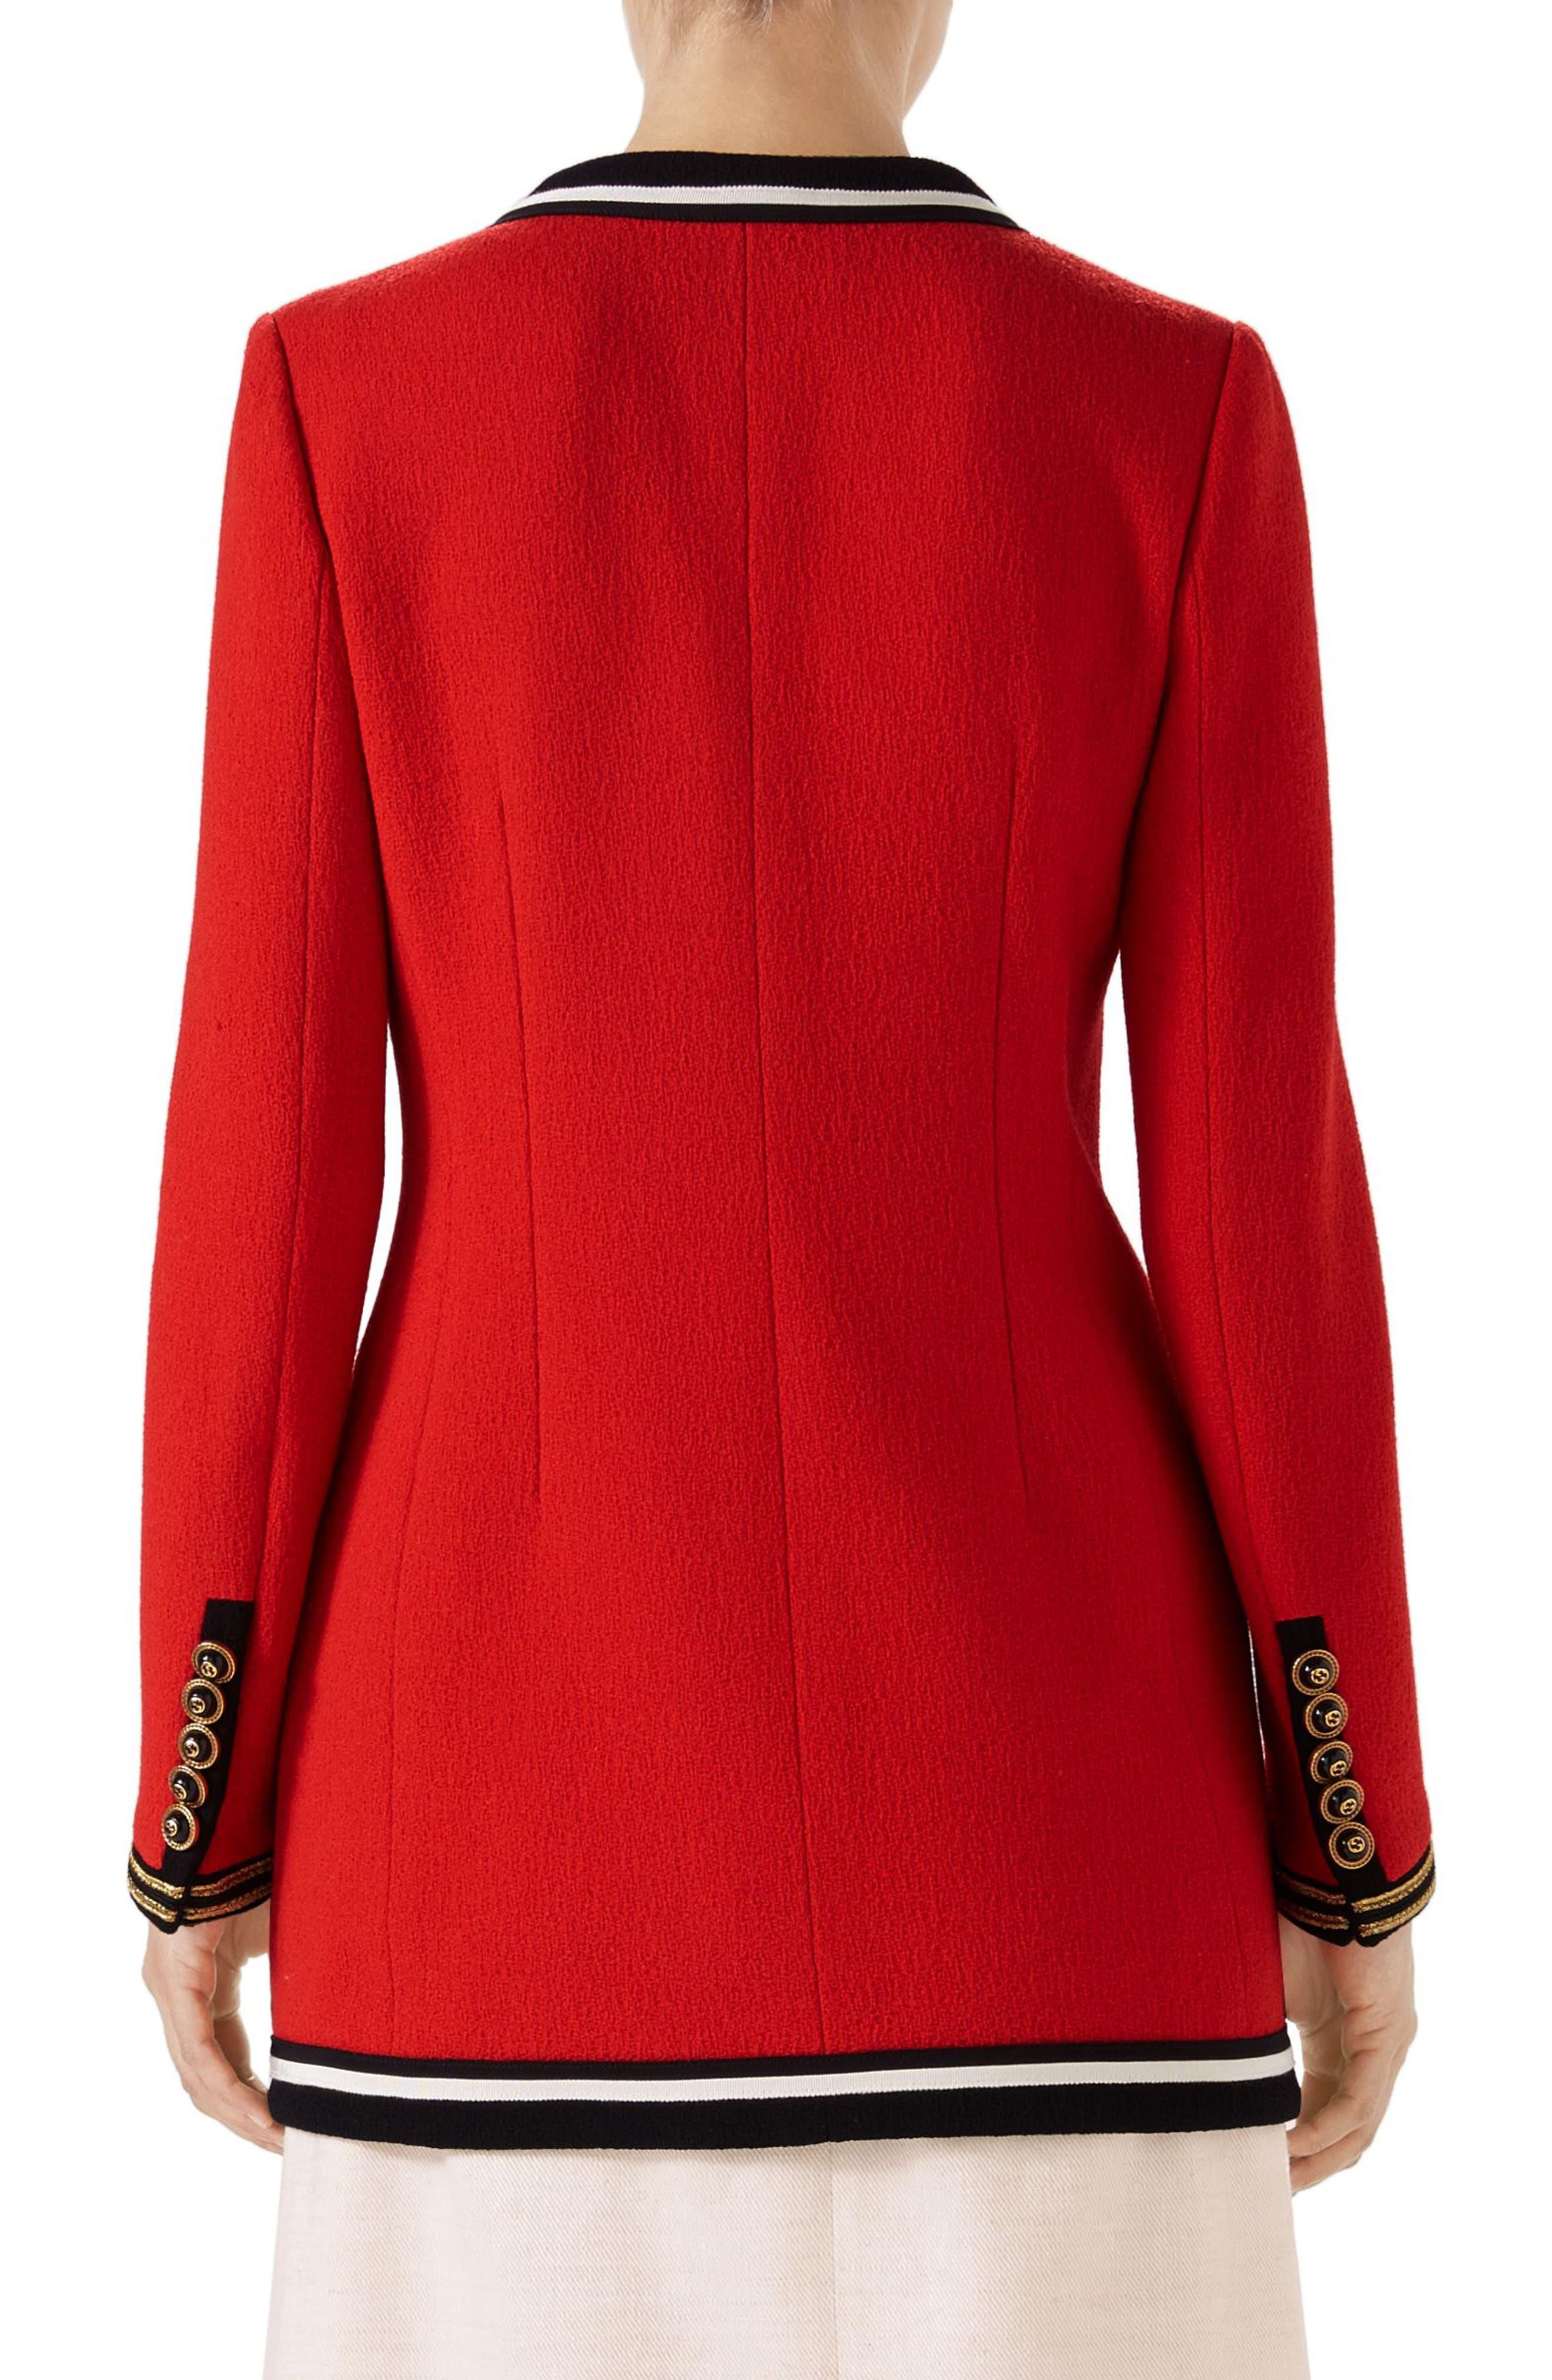 Wool Sable Long Jacket,                             Alternate thumbnail 2, color,                             Renaissance Red/ Multicolor